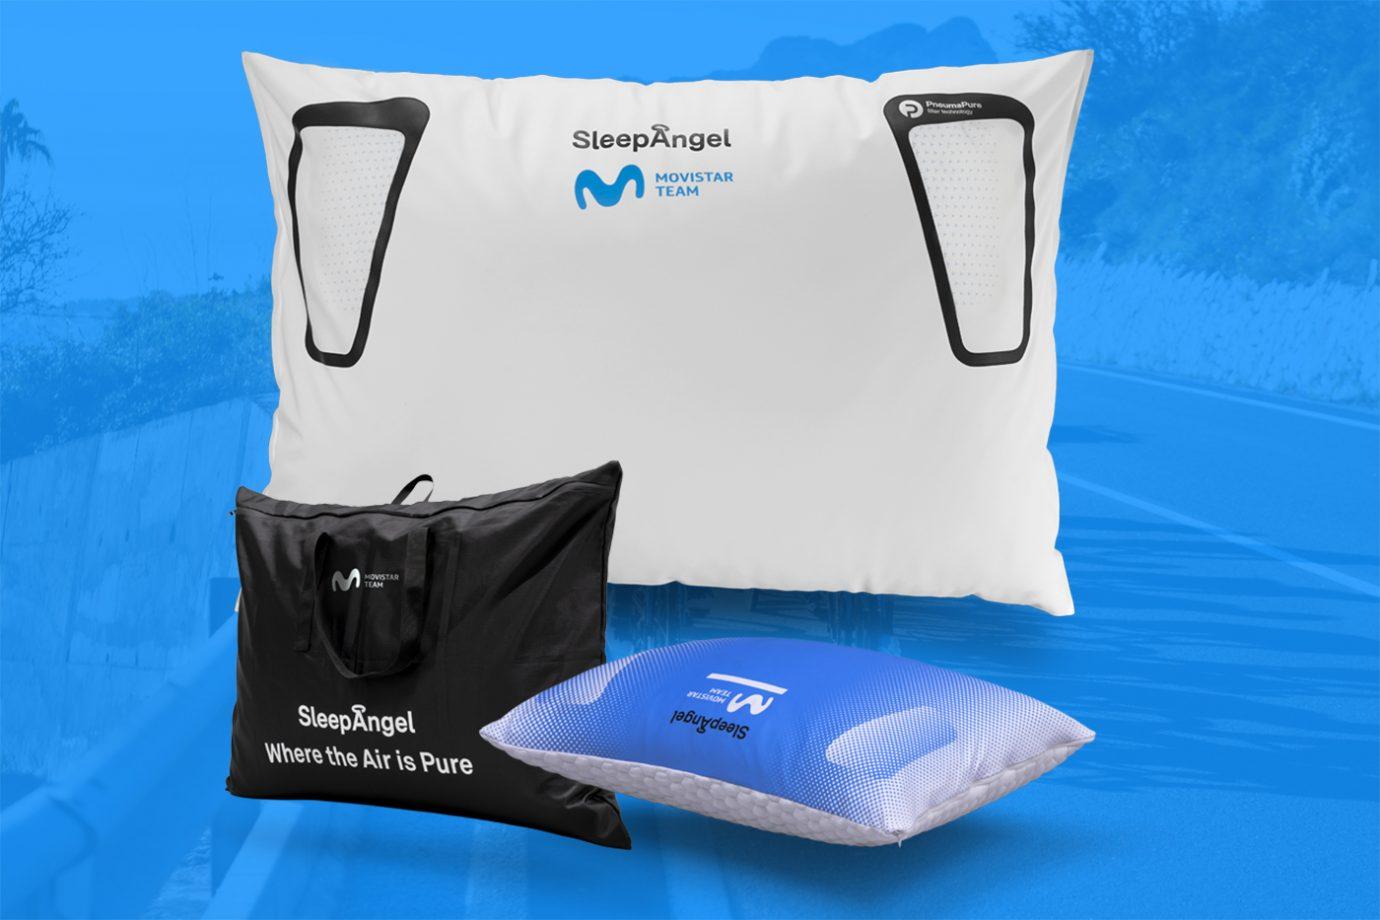 Imagen de la noticia 'SleepAngel gives you 2 packs of Movistar-branded microfibre pillow sets!'